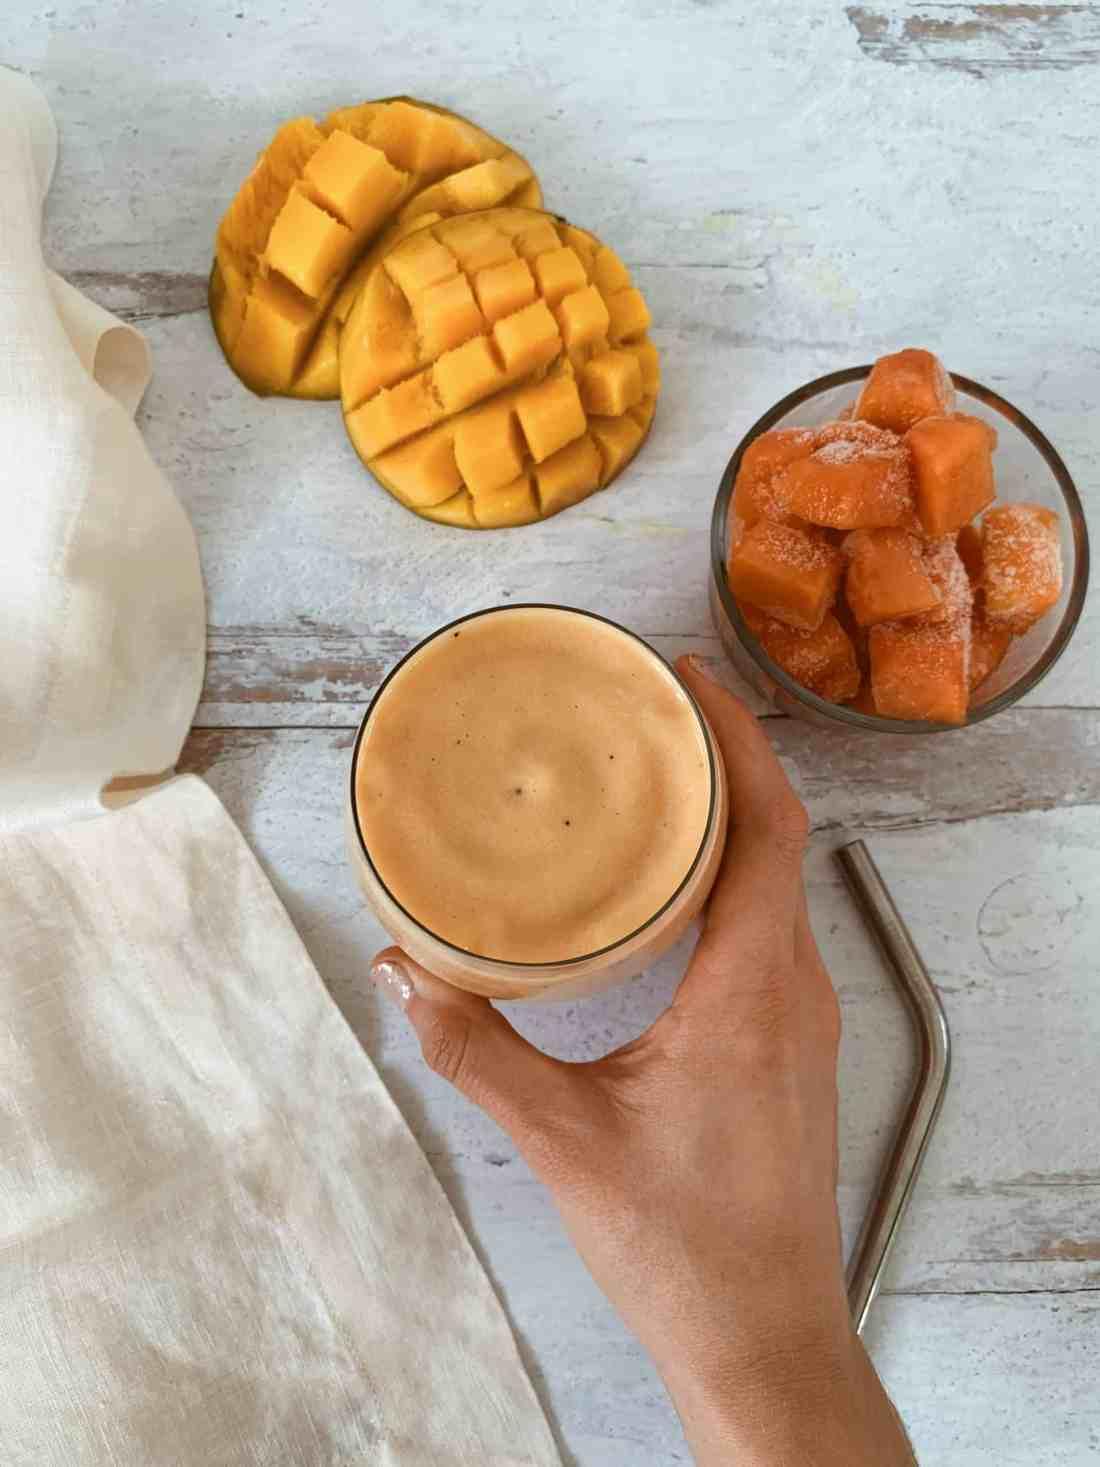 Hand holding a tropical mango smoothie.